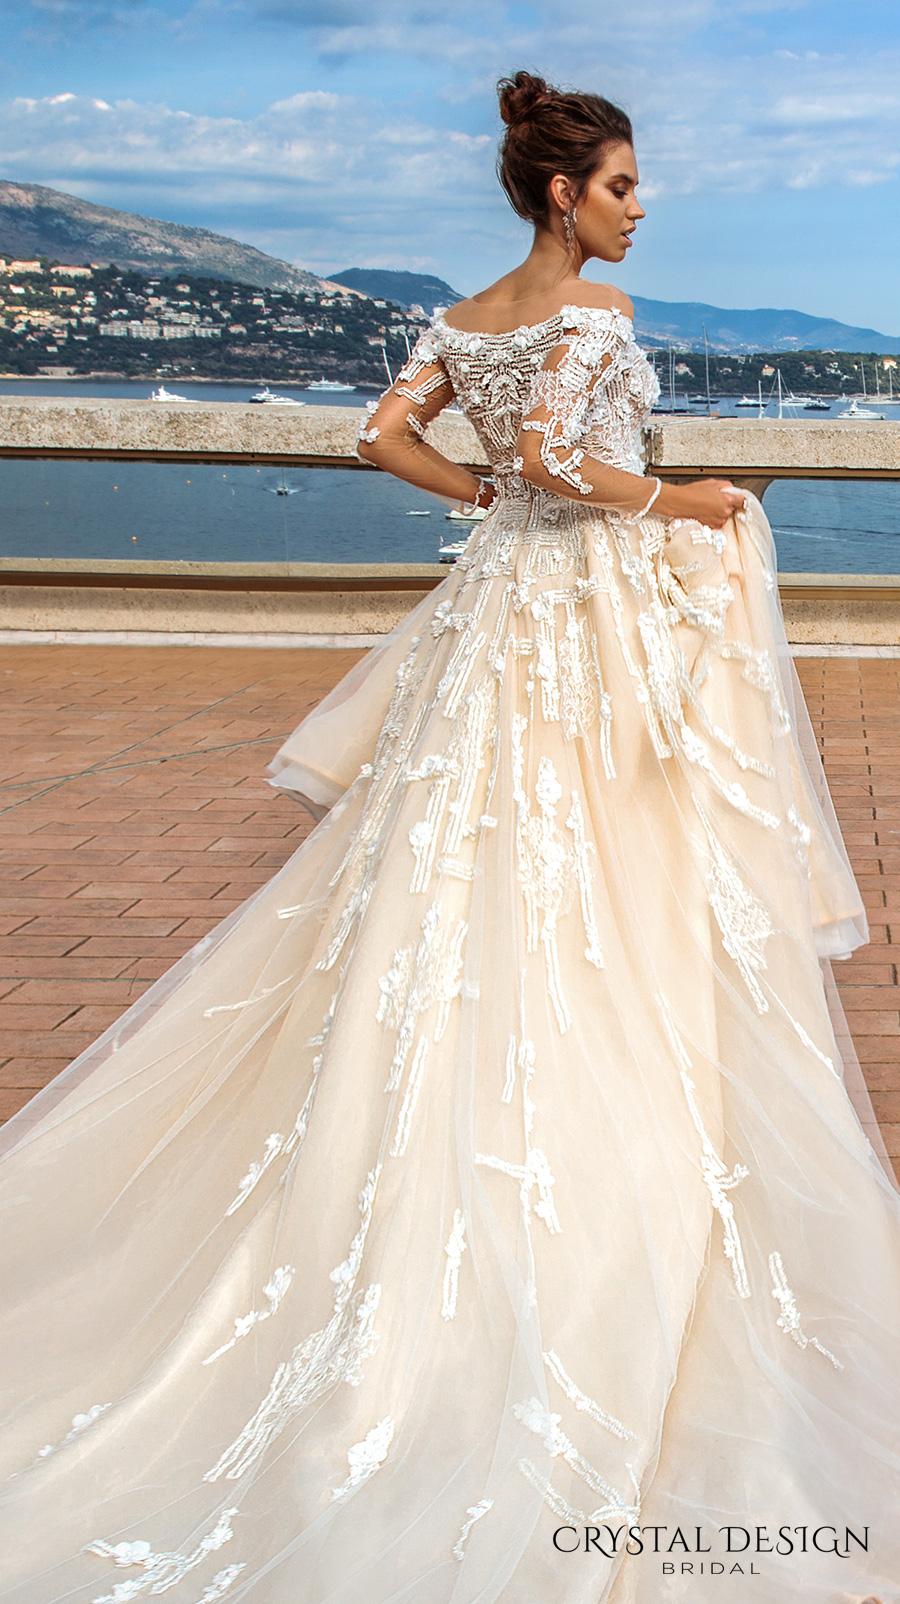 crystal design 2017 bridal long sleeves off the shoulder heavily embellished bodice romantic elegant ivory color a  line wedding dress lace back long train (brianne) zsdv